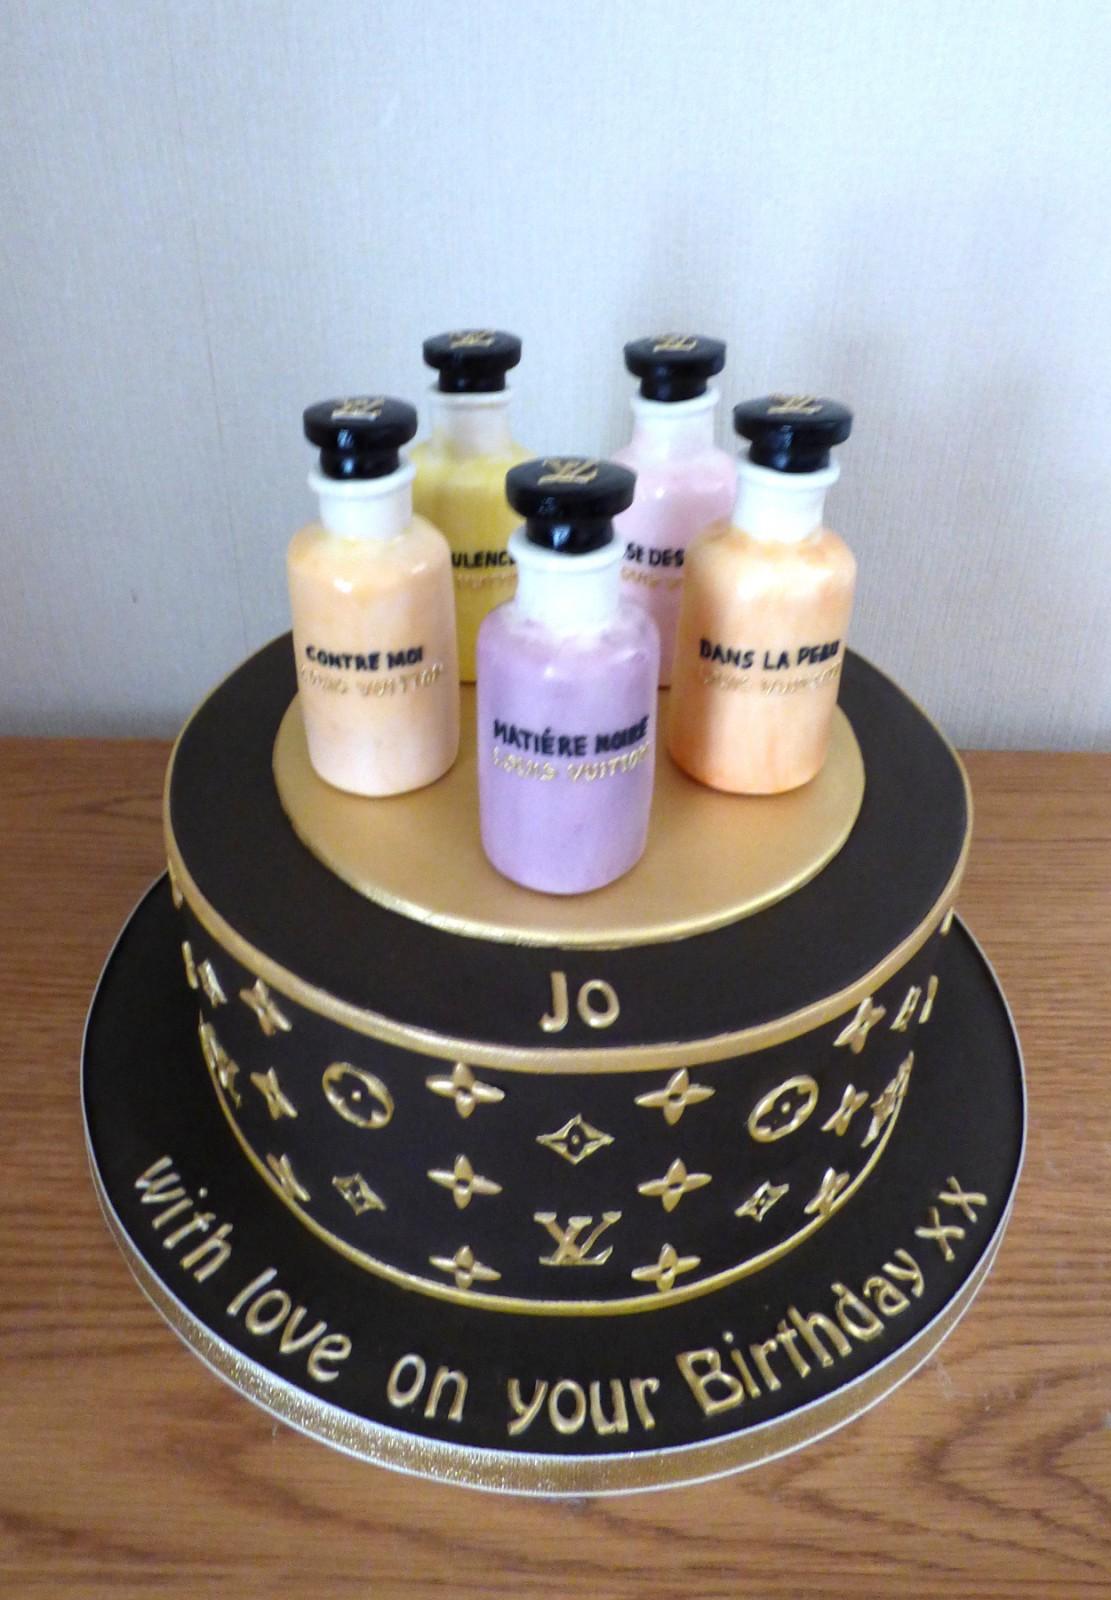 Stupendous Louis Vuitton Perfume Bottles Birthday Cake Susies Cakes Funny Birthday Cards Online Necthendildamsfinfo